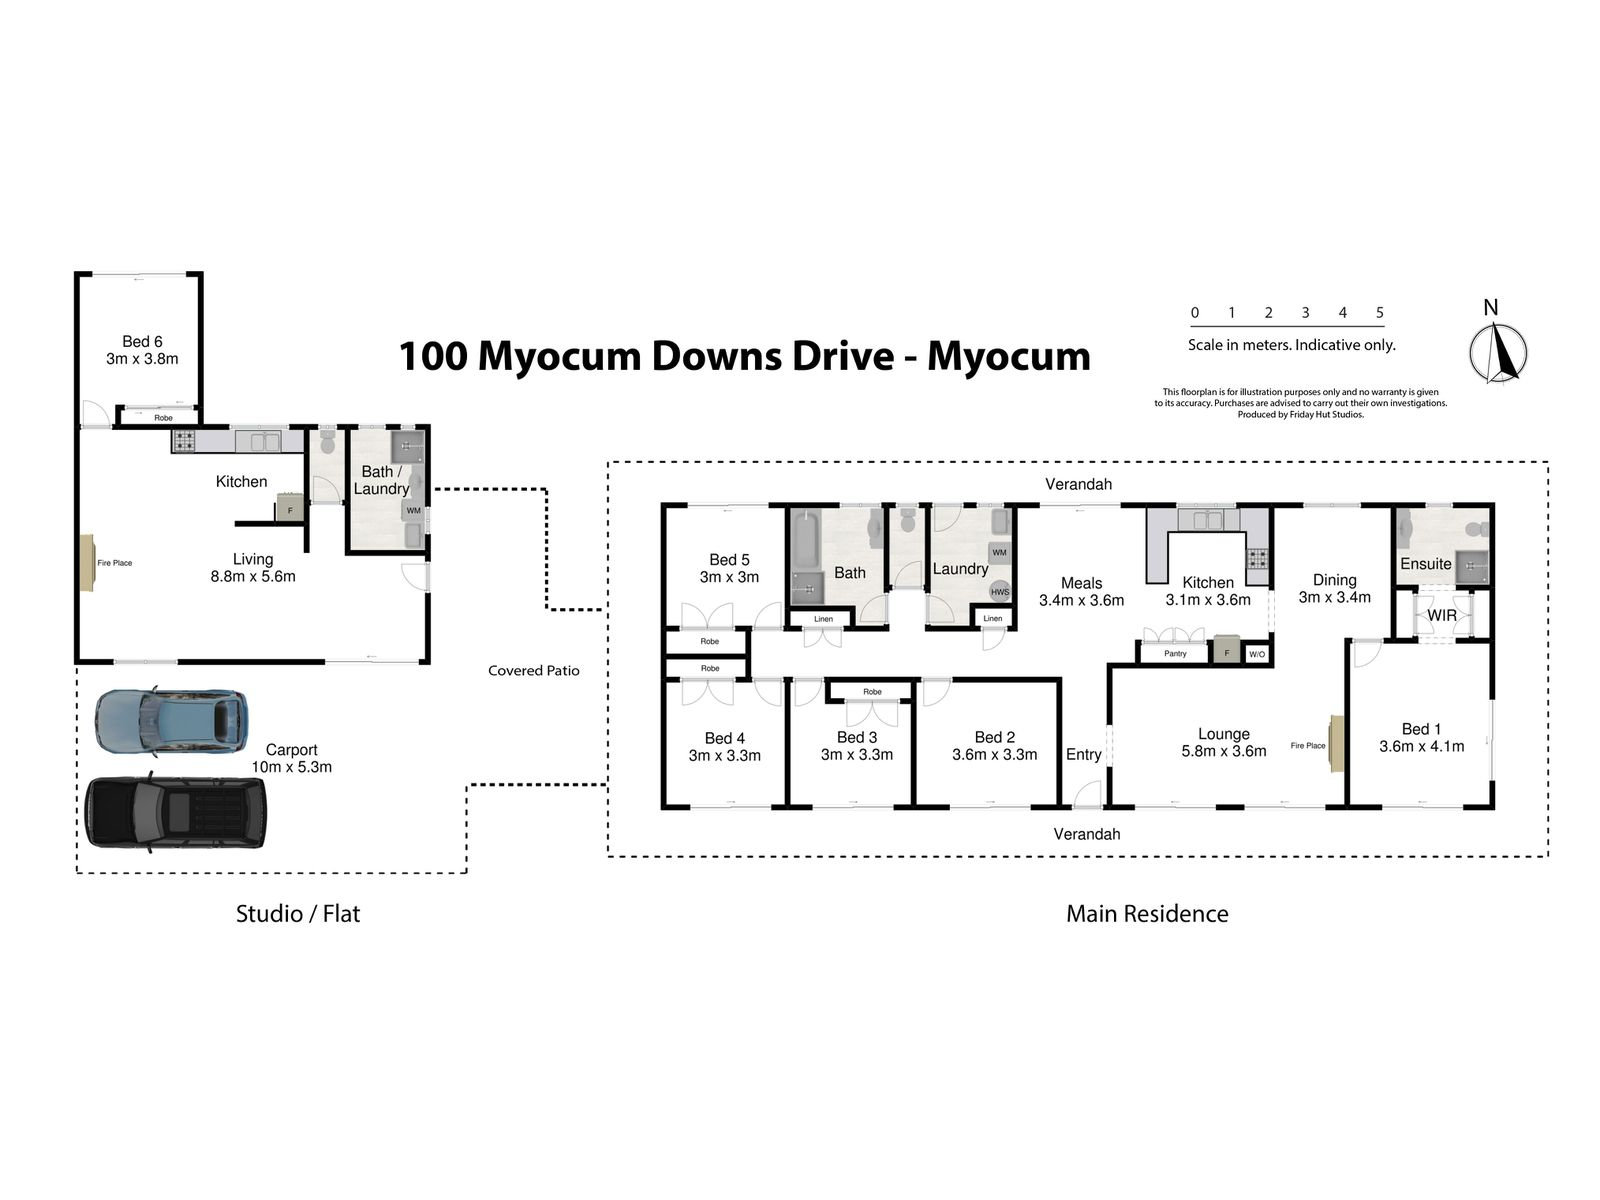 100 Myocum Downs Drive, Myocum